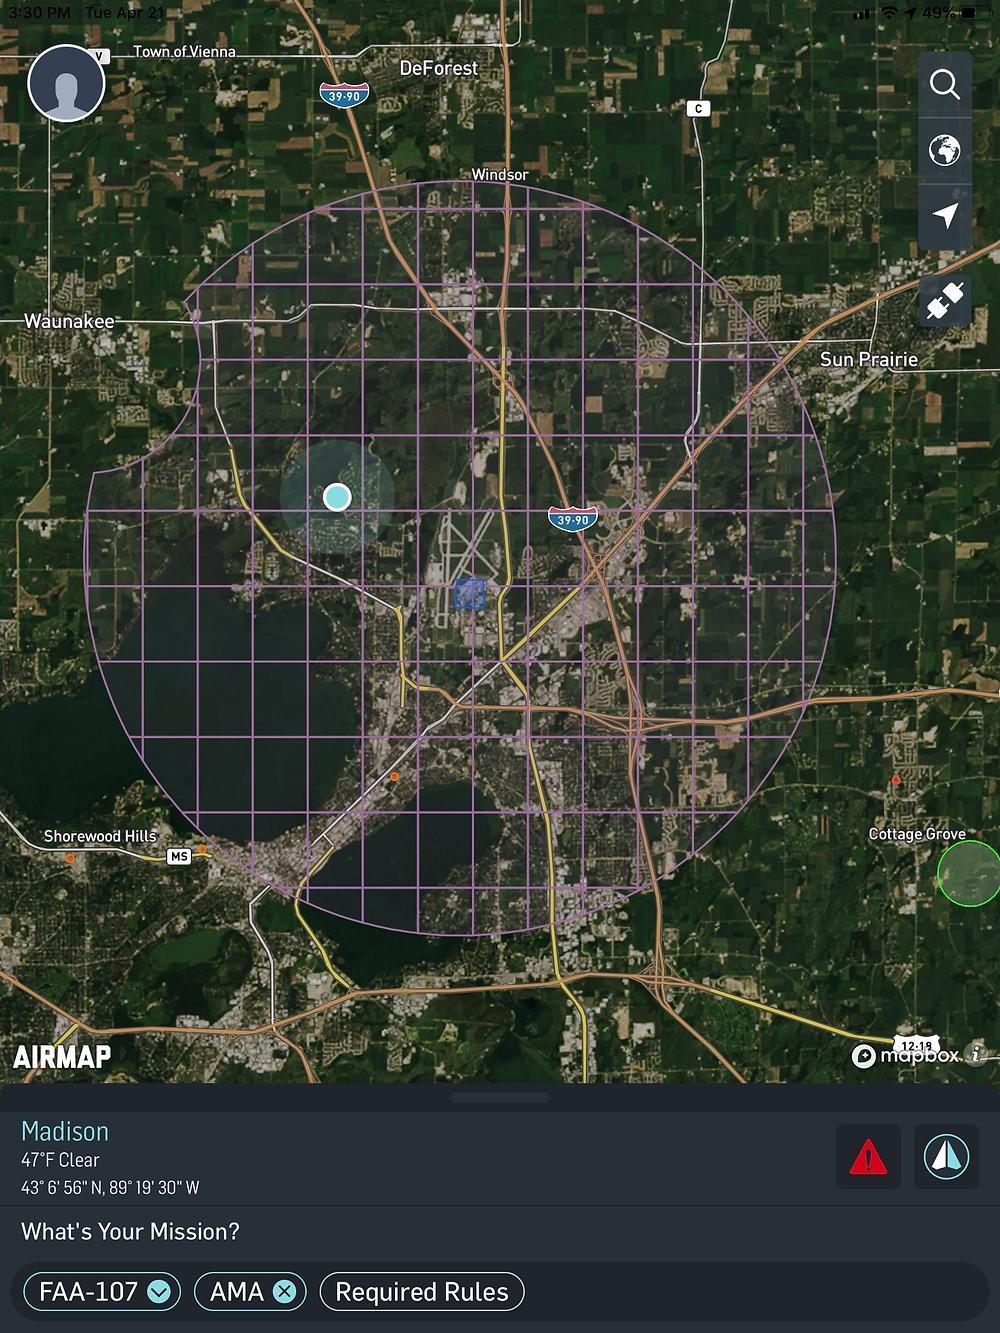 FAA drone authorizations zones surrounding Dane County (WI) Regional Airport.